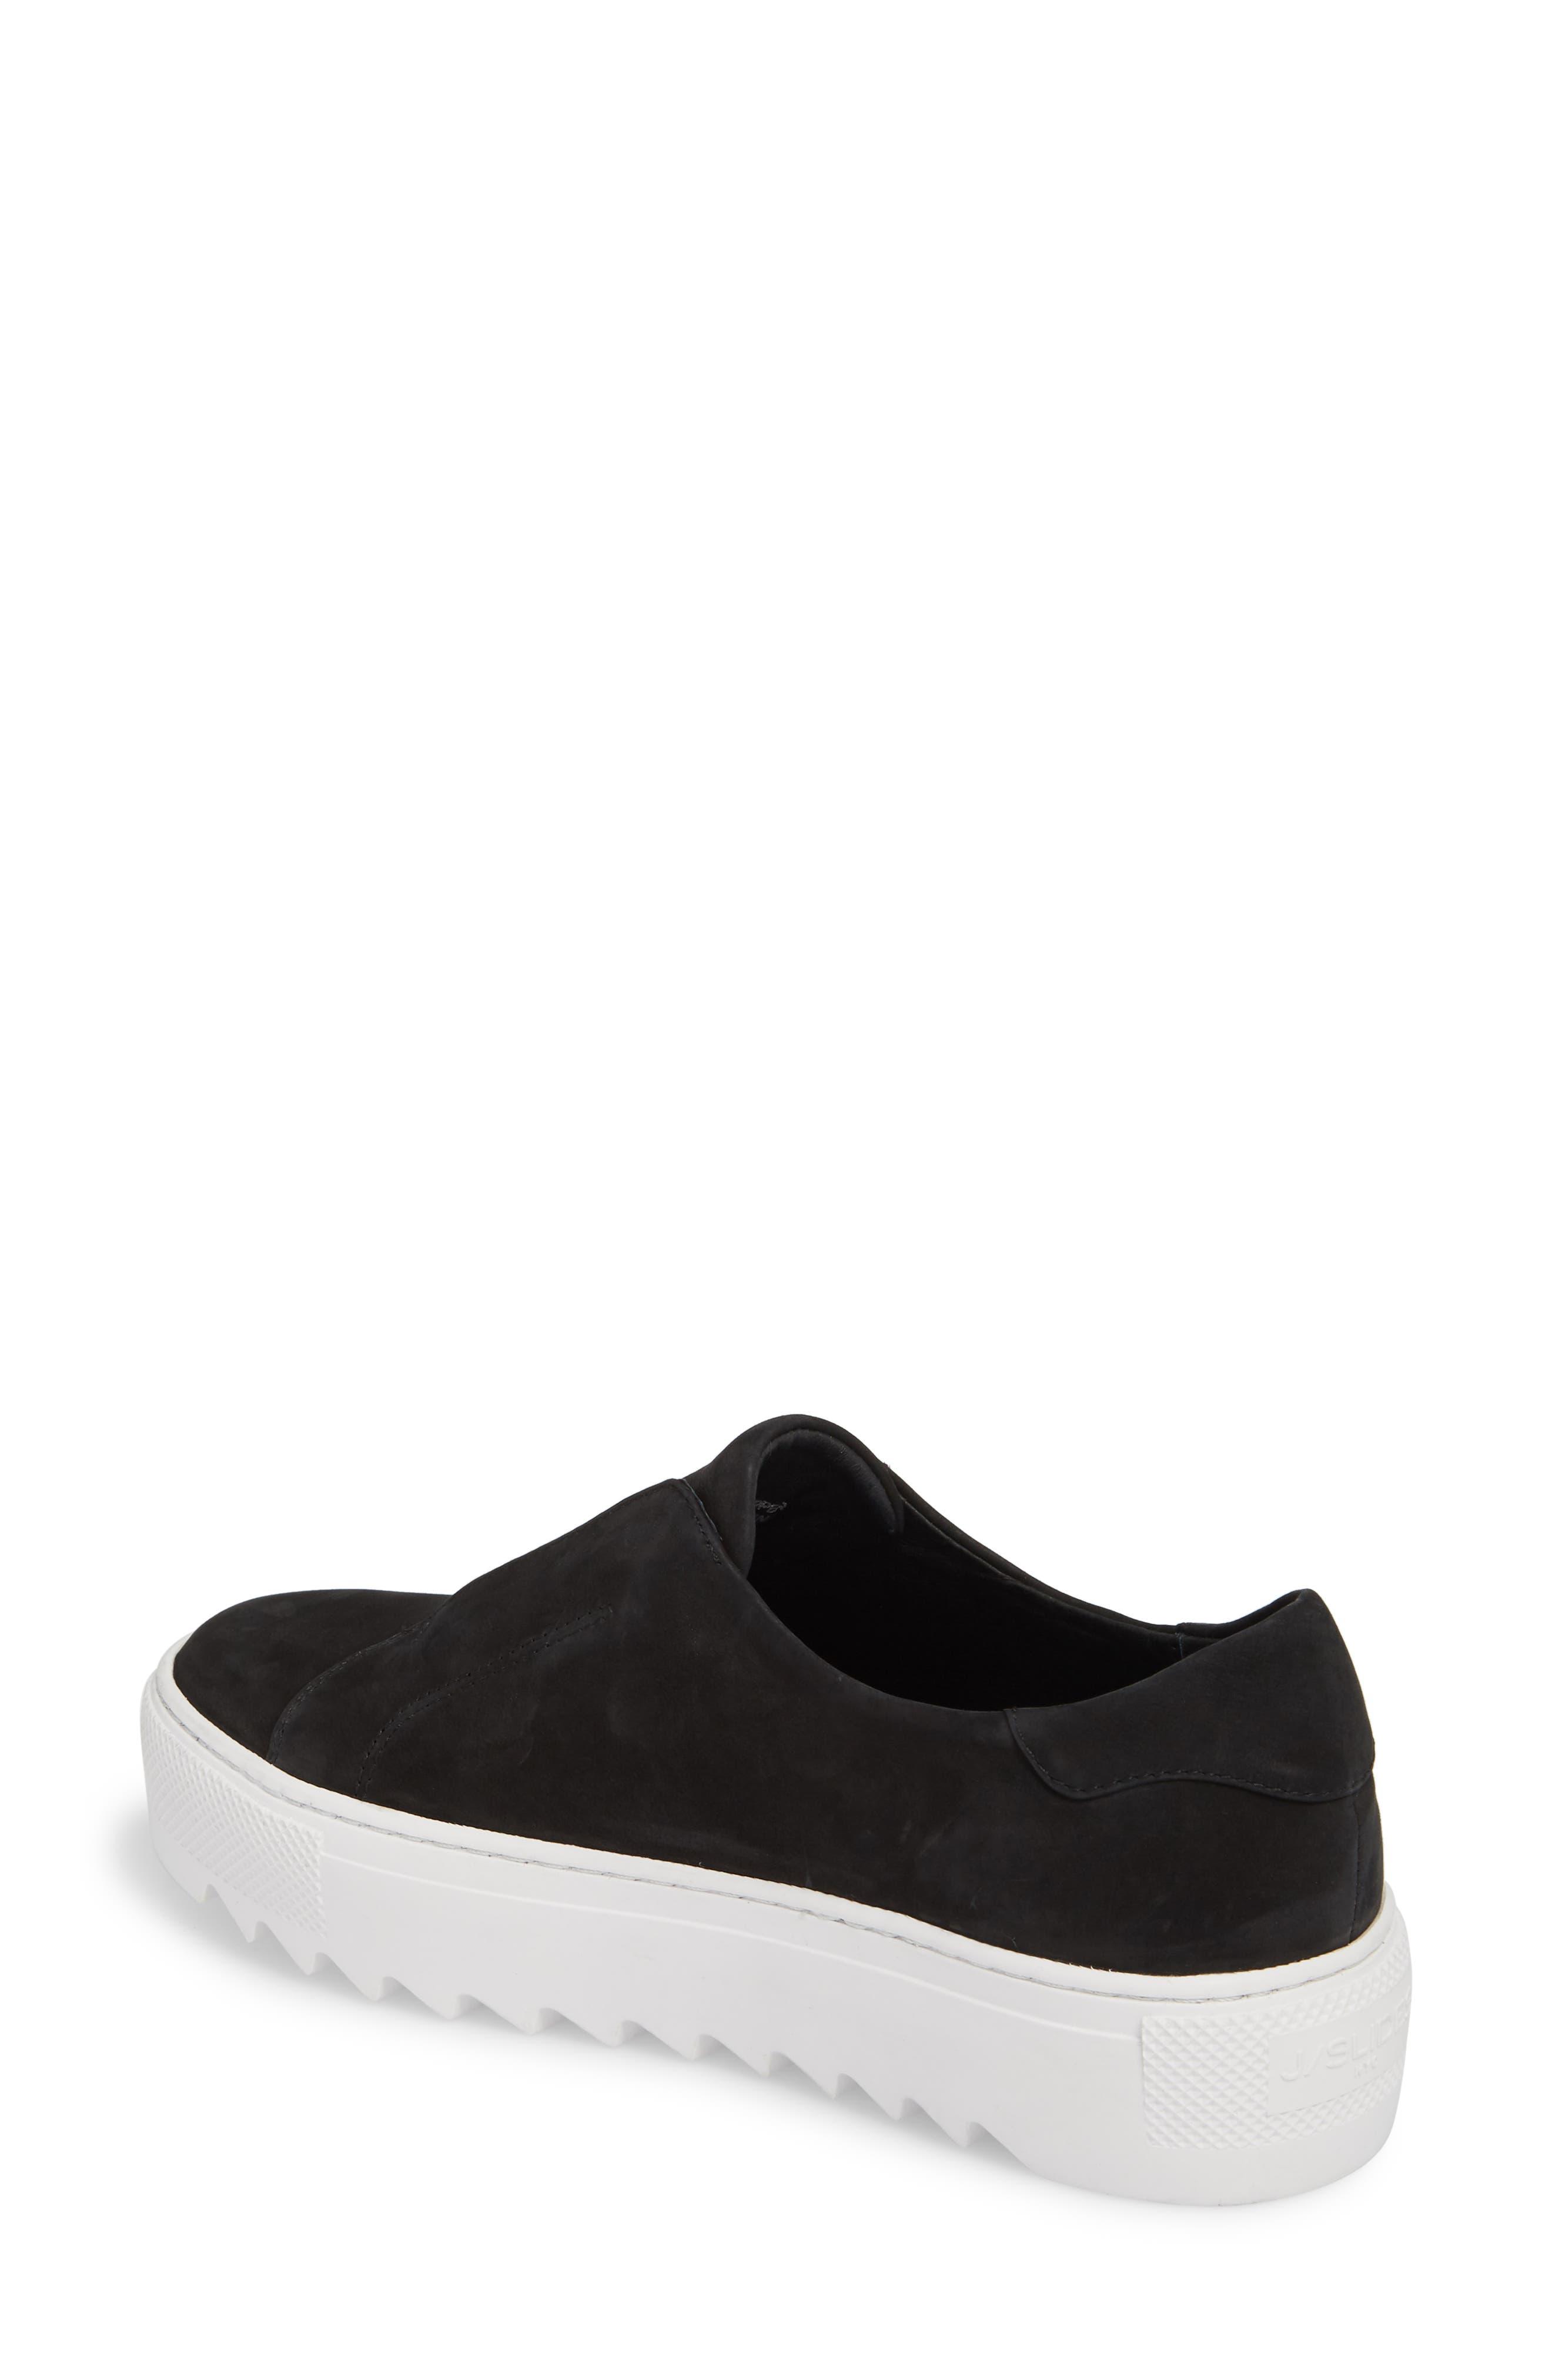 Spazo Slip-On Platform Sneaker,                             Alternate thumbnail 2, color,                             001